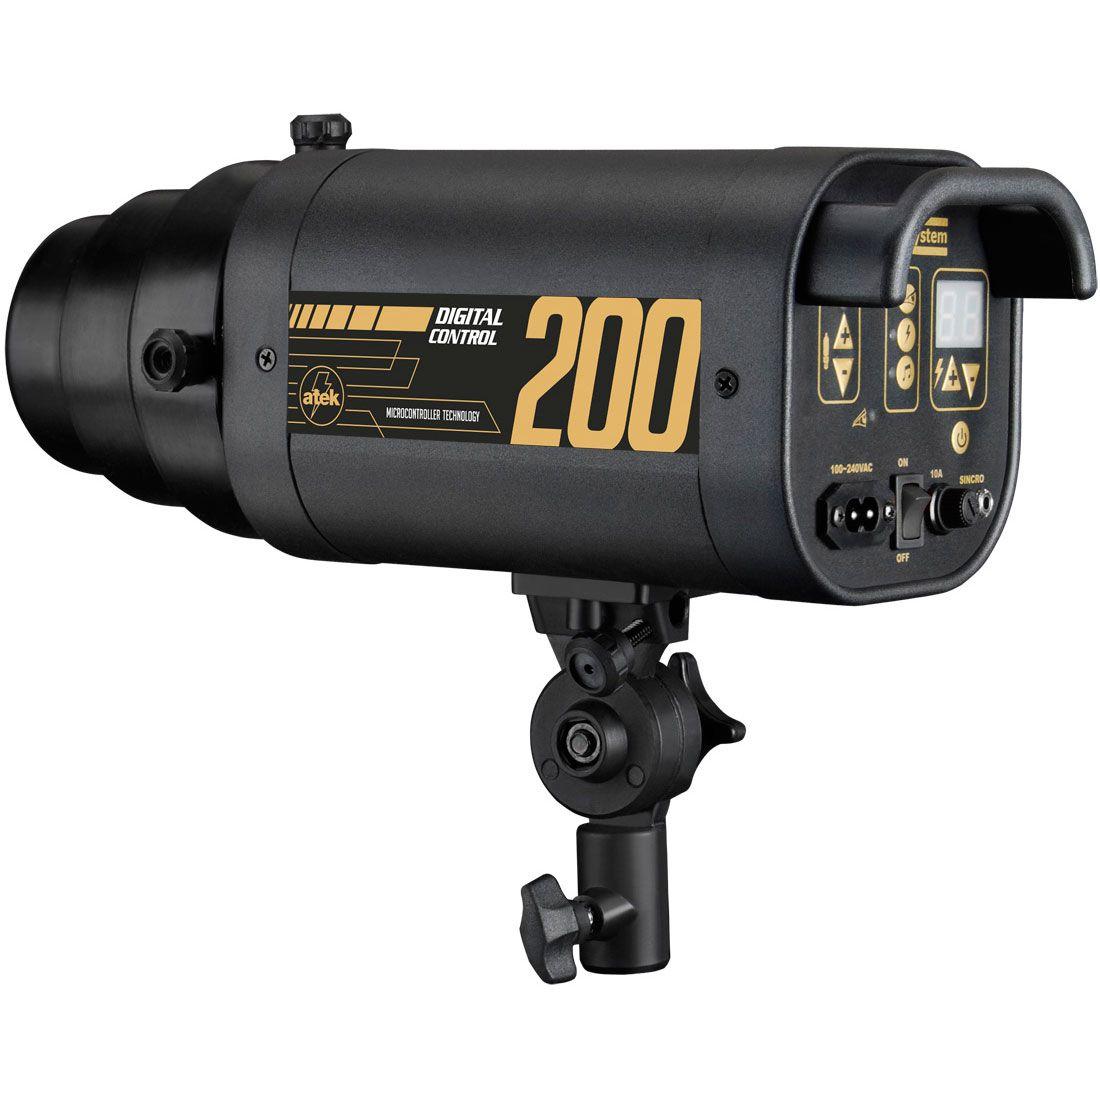 AT1560 – Conjunto NewBorn com Soft Sombrinha 150 + Flash Digital 200 Control